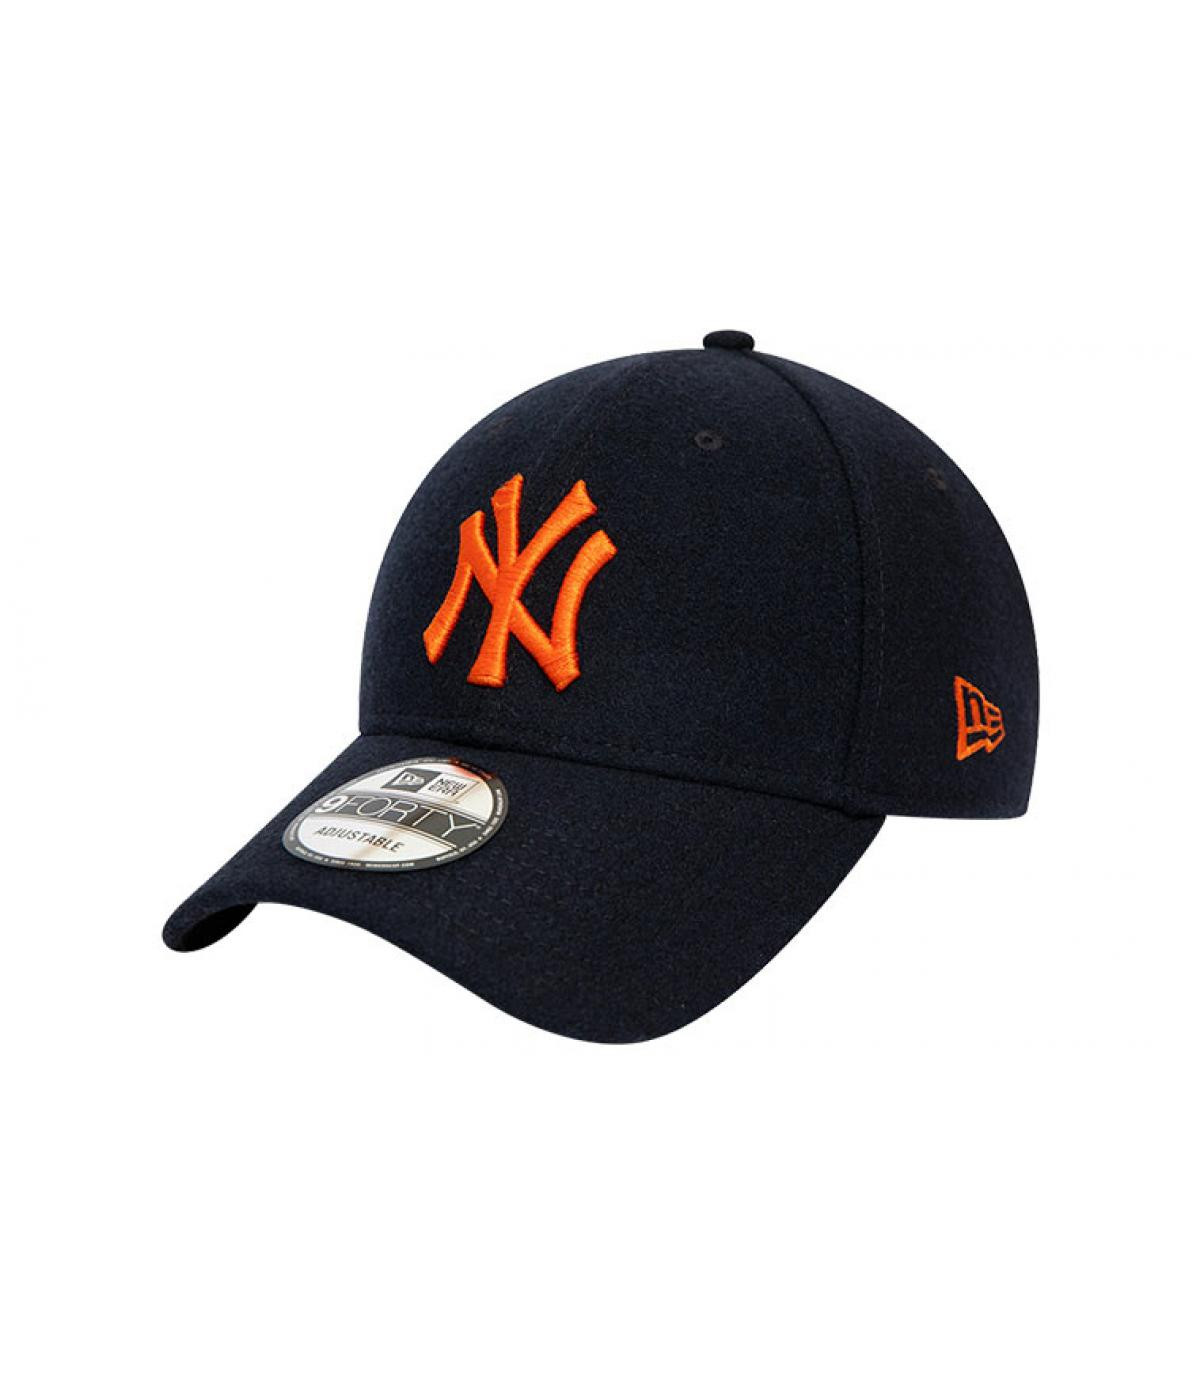 casquette NY bleu orange laine